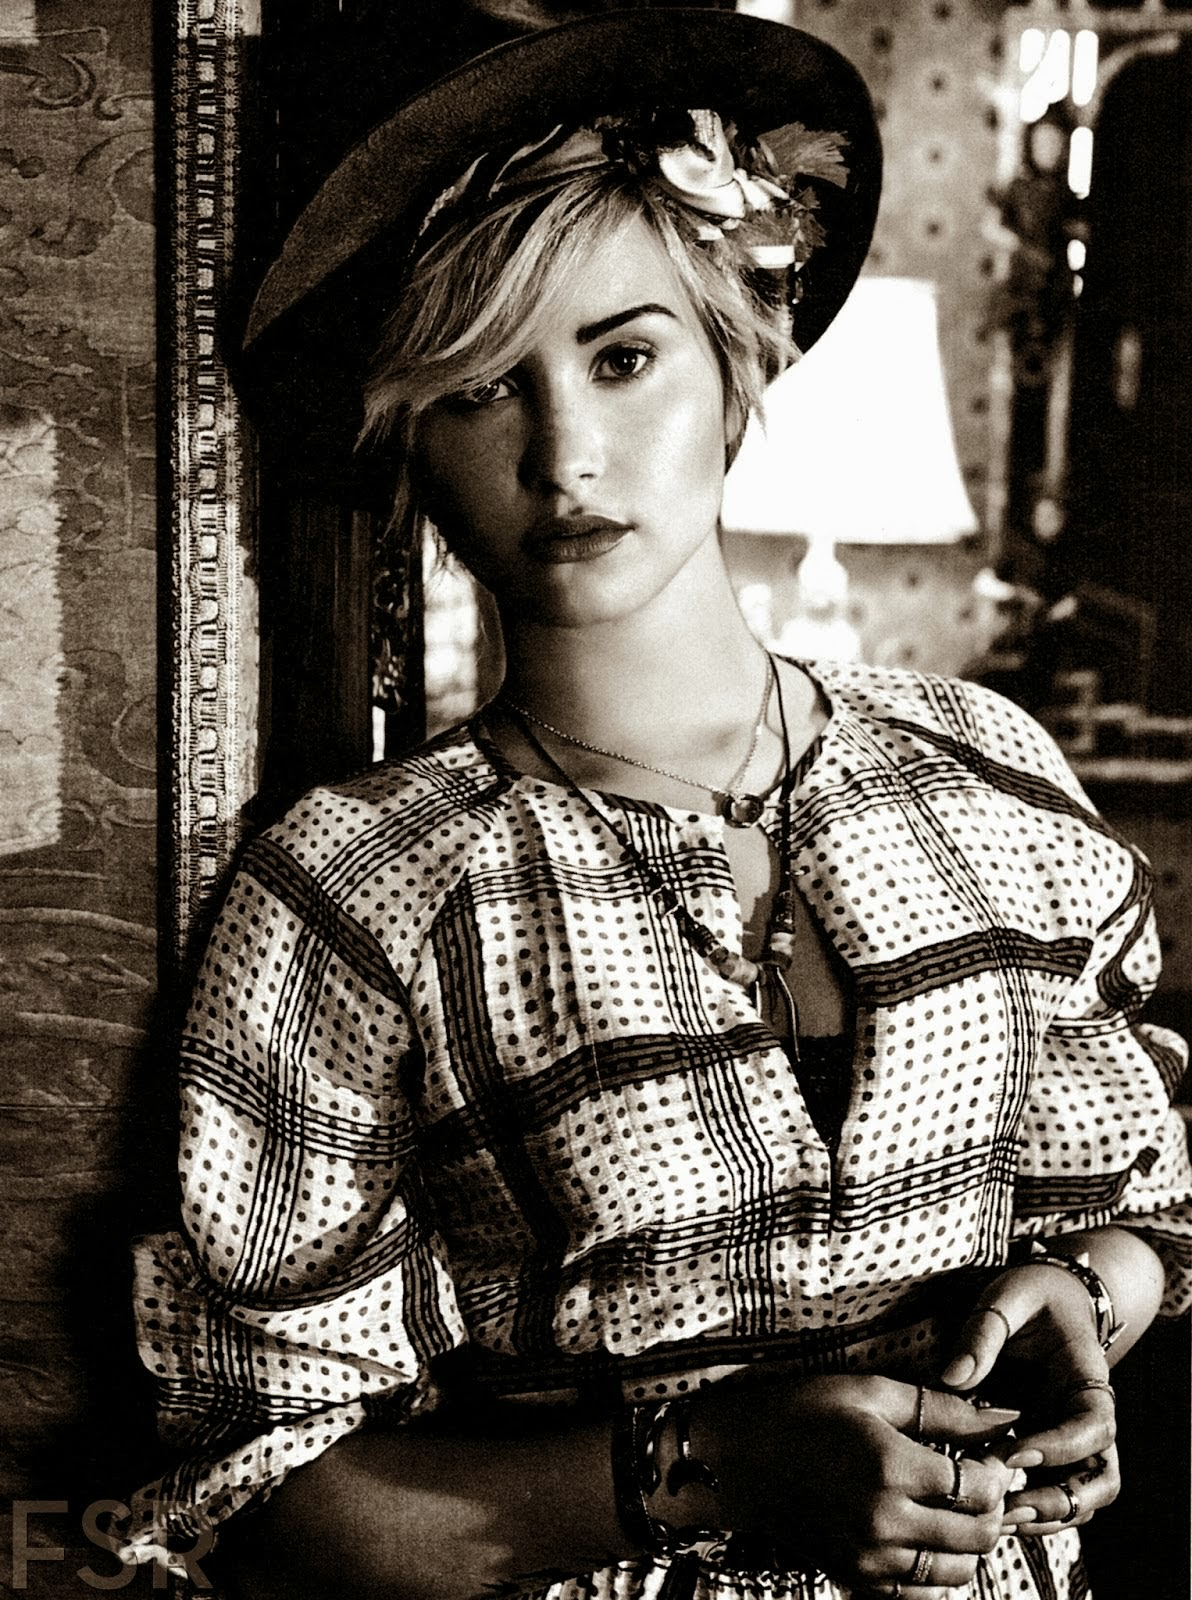 Demi Lovato by Giampaolo Sgura for Teen Vogue November 2013Demi Lovato Teen Vogue Photoshoot